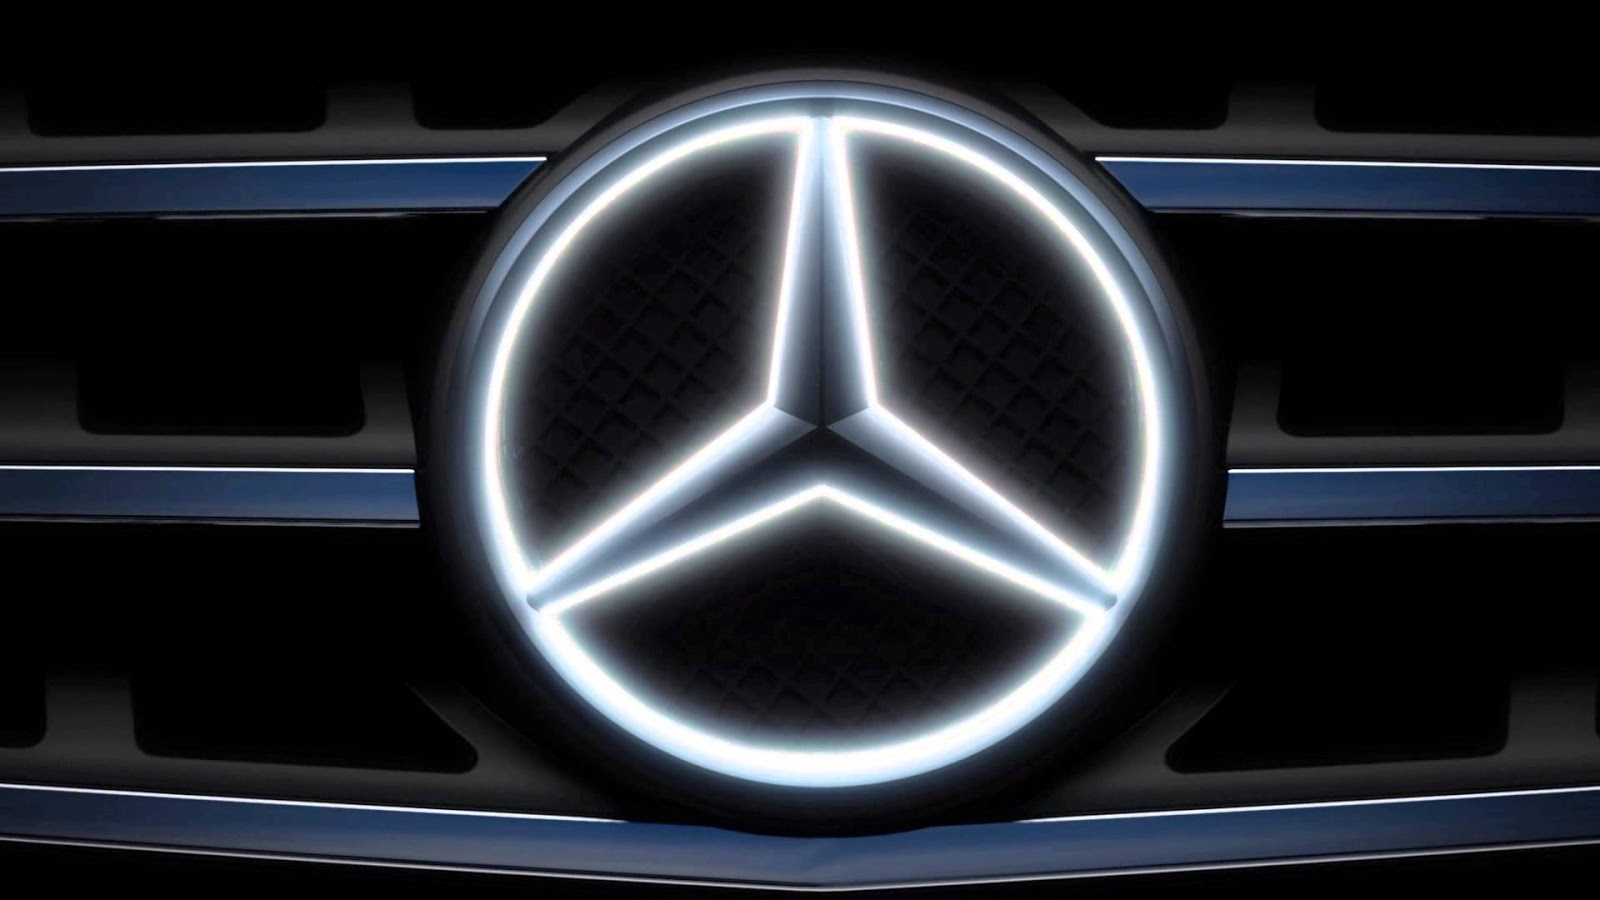 Imagehub Mercedes Benz Logo Hd